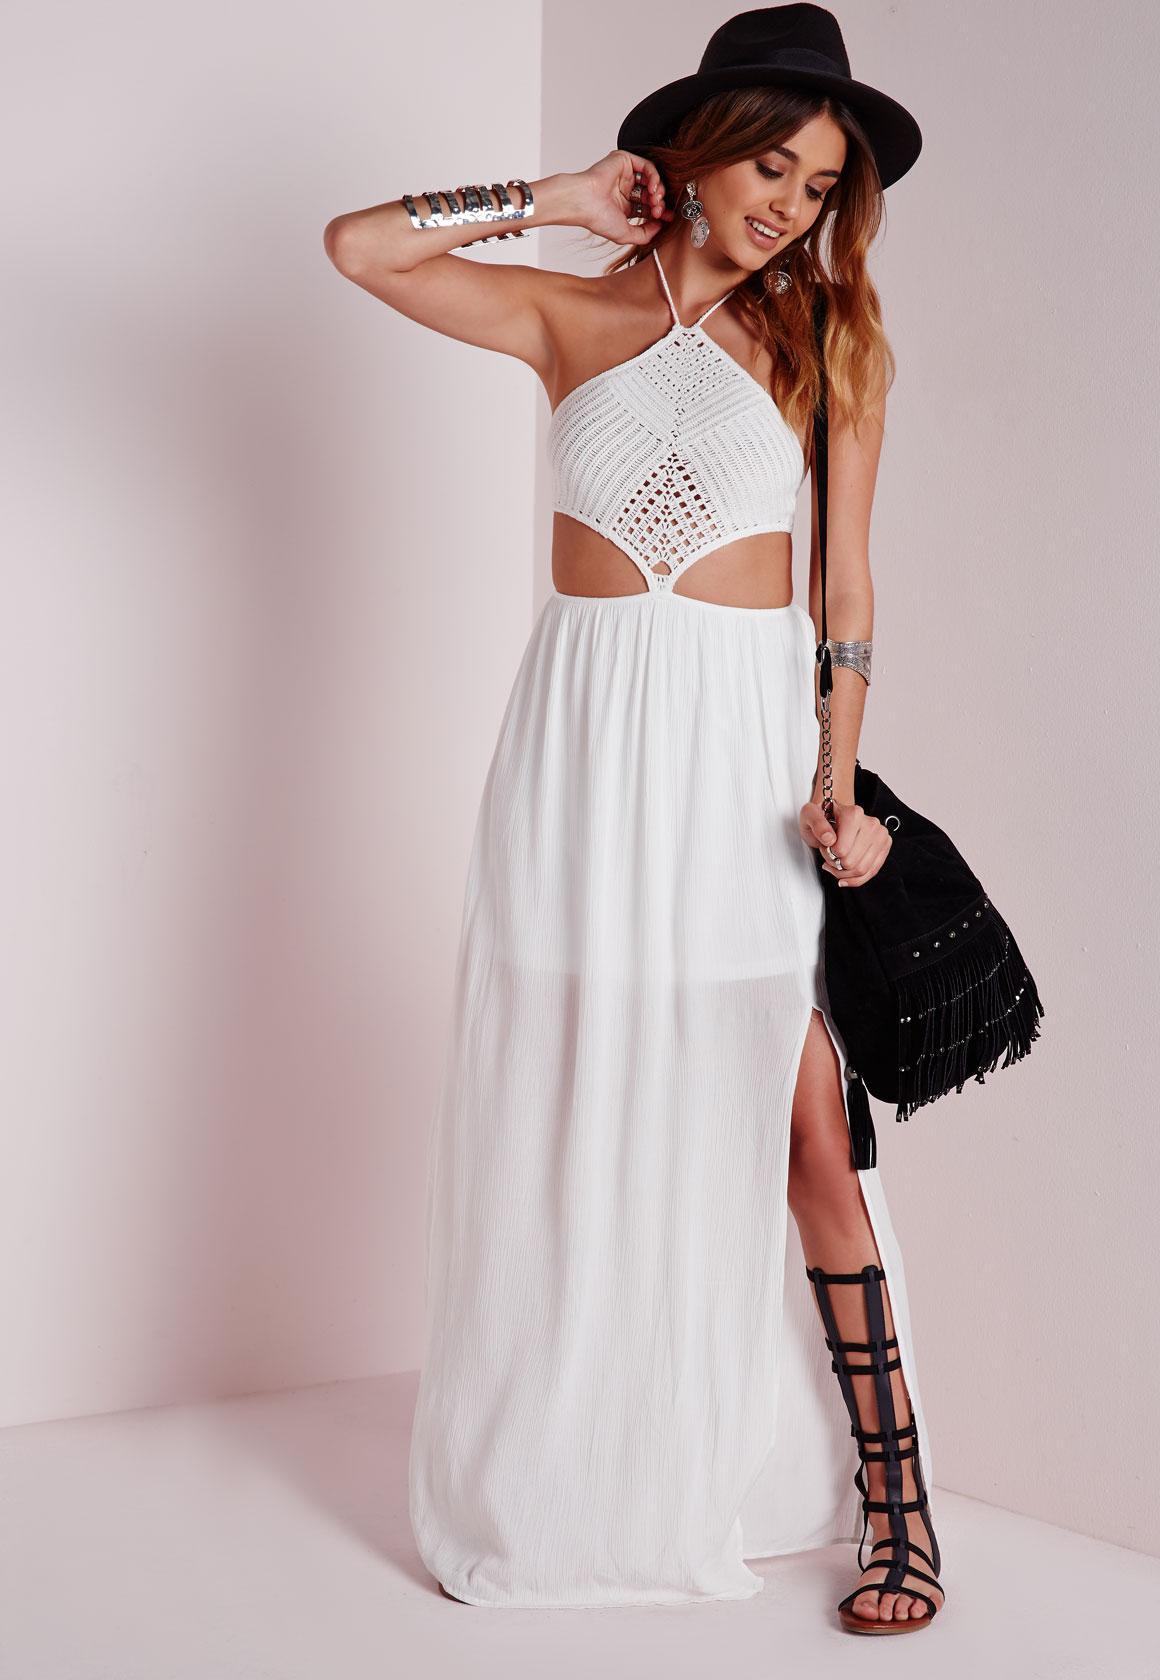 Crochet Halter Neck Cut Out Maxi Dress White - Dresses - Maxi ...